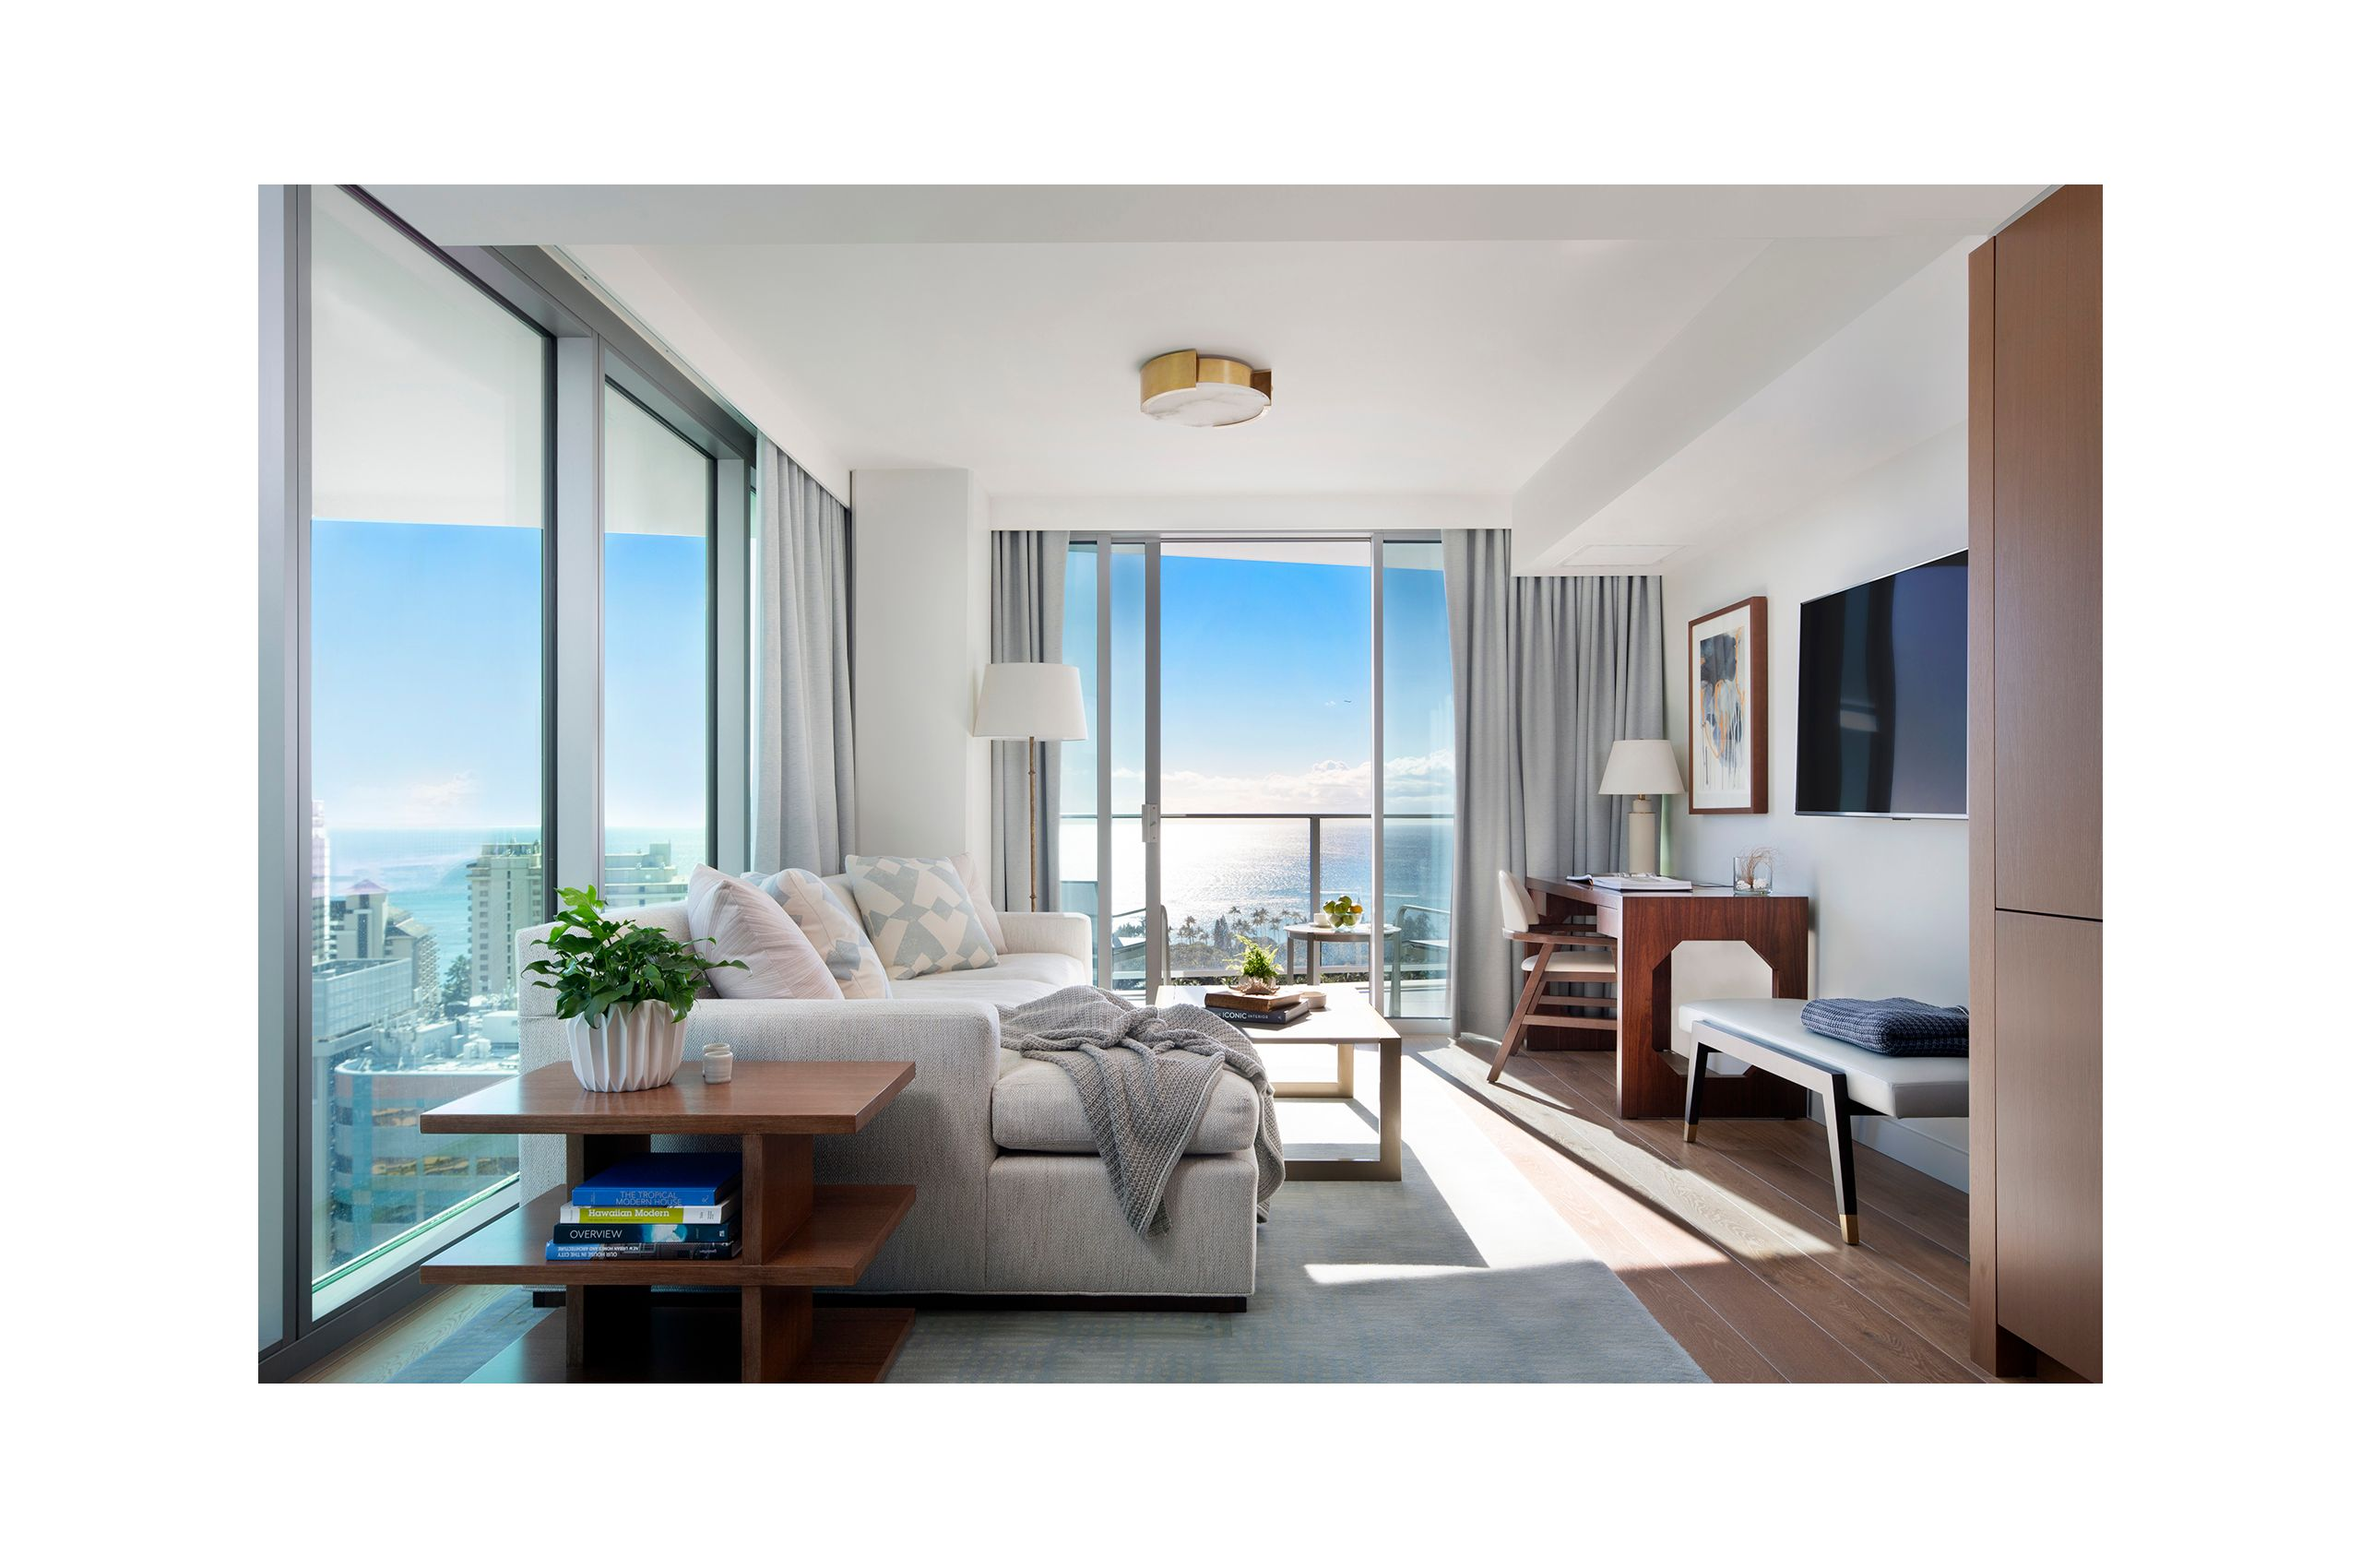 NEWLIVEBOOKS-RitzCarlton-LivingRoom.jpg